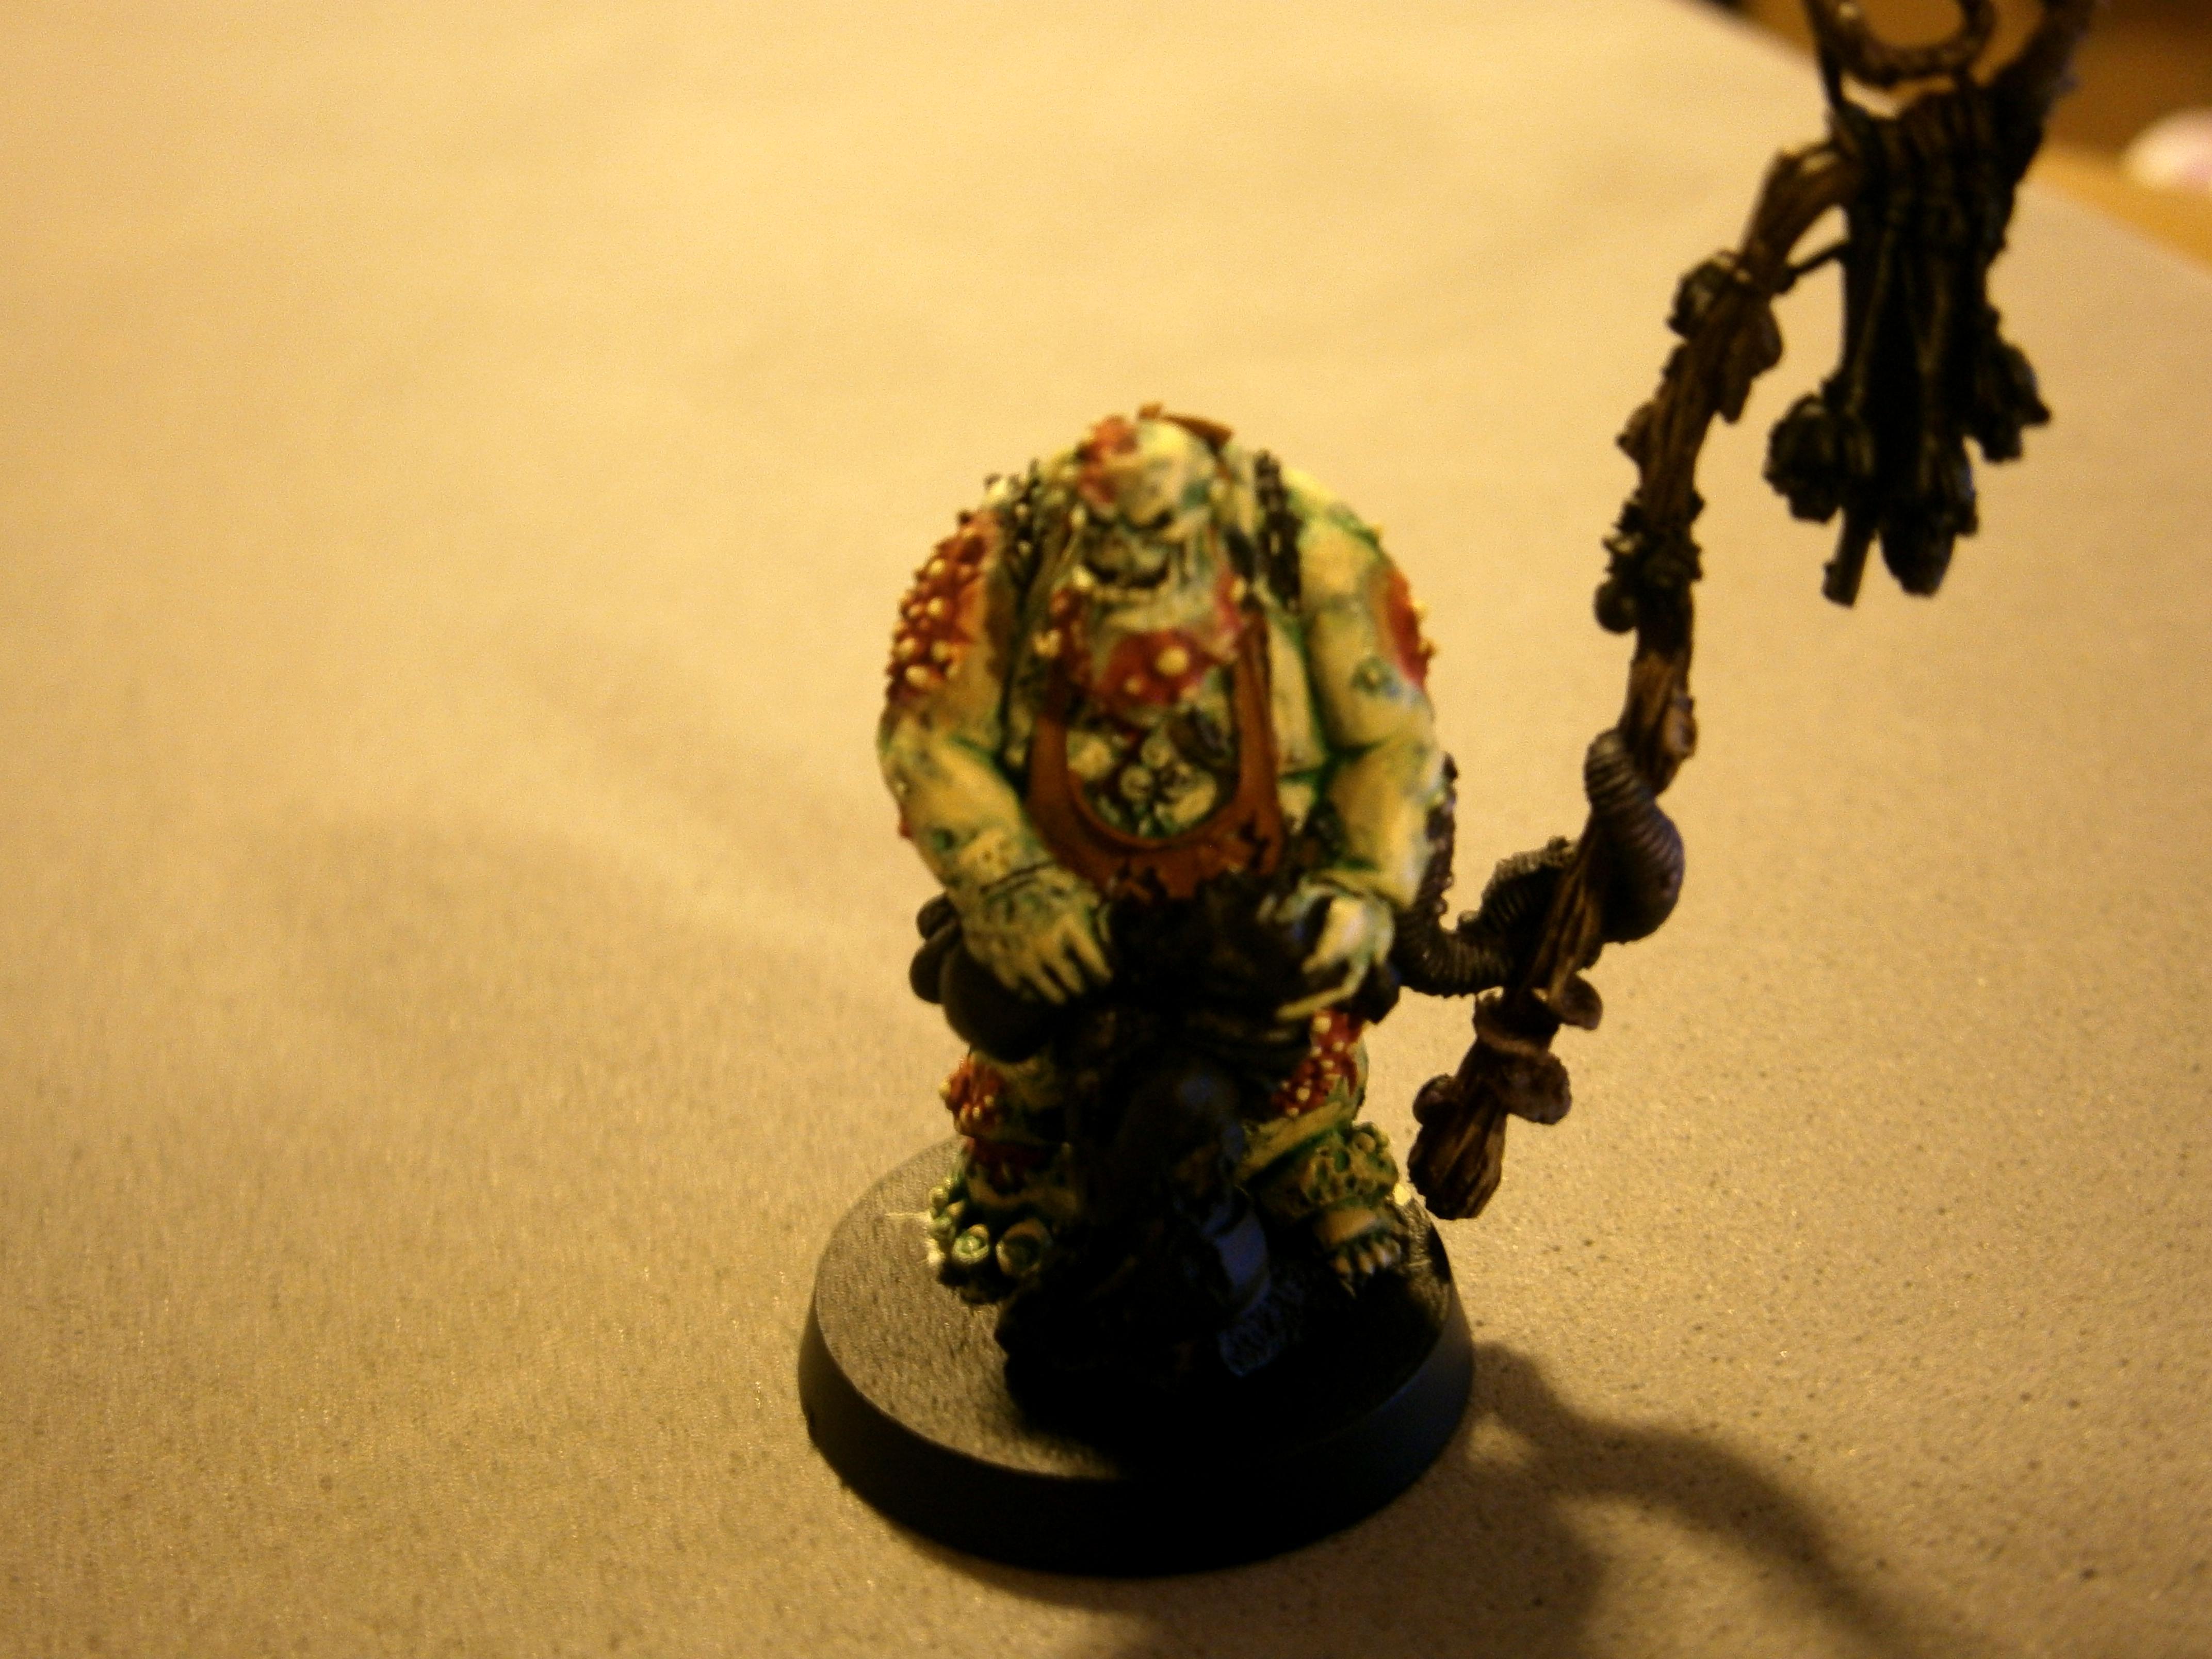 Chaos, Festus, Festus The Leech Lord, Gross, Leechlord, Nurgle, Rot, Swamp